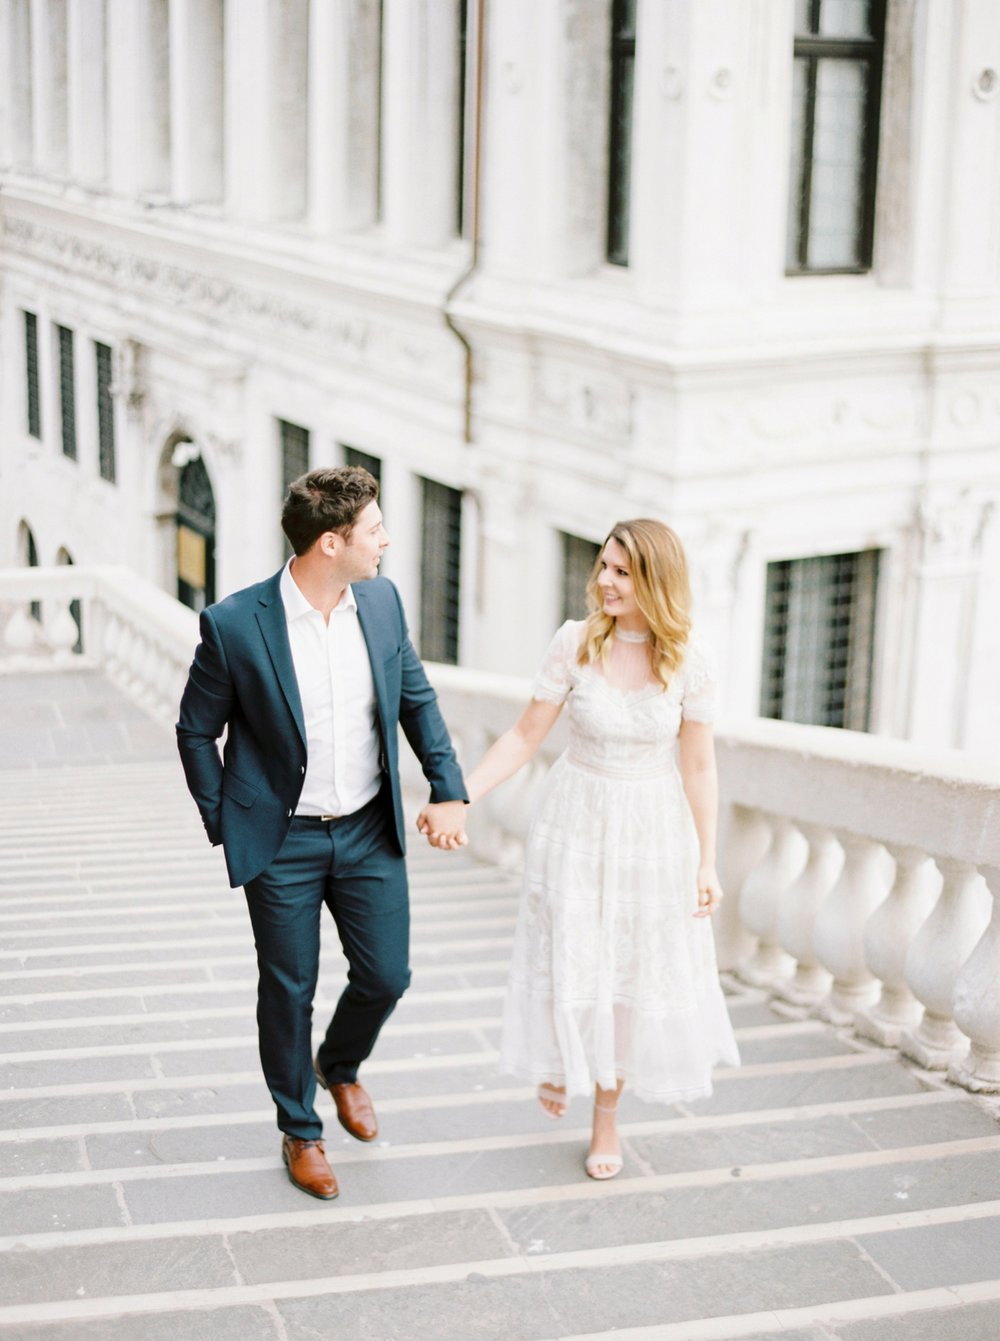 Venice couples anniversary session | pre wedding photos around the venice canals | fine art film photographer Justine Milton